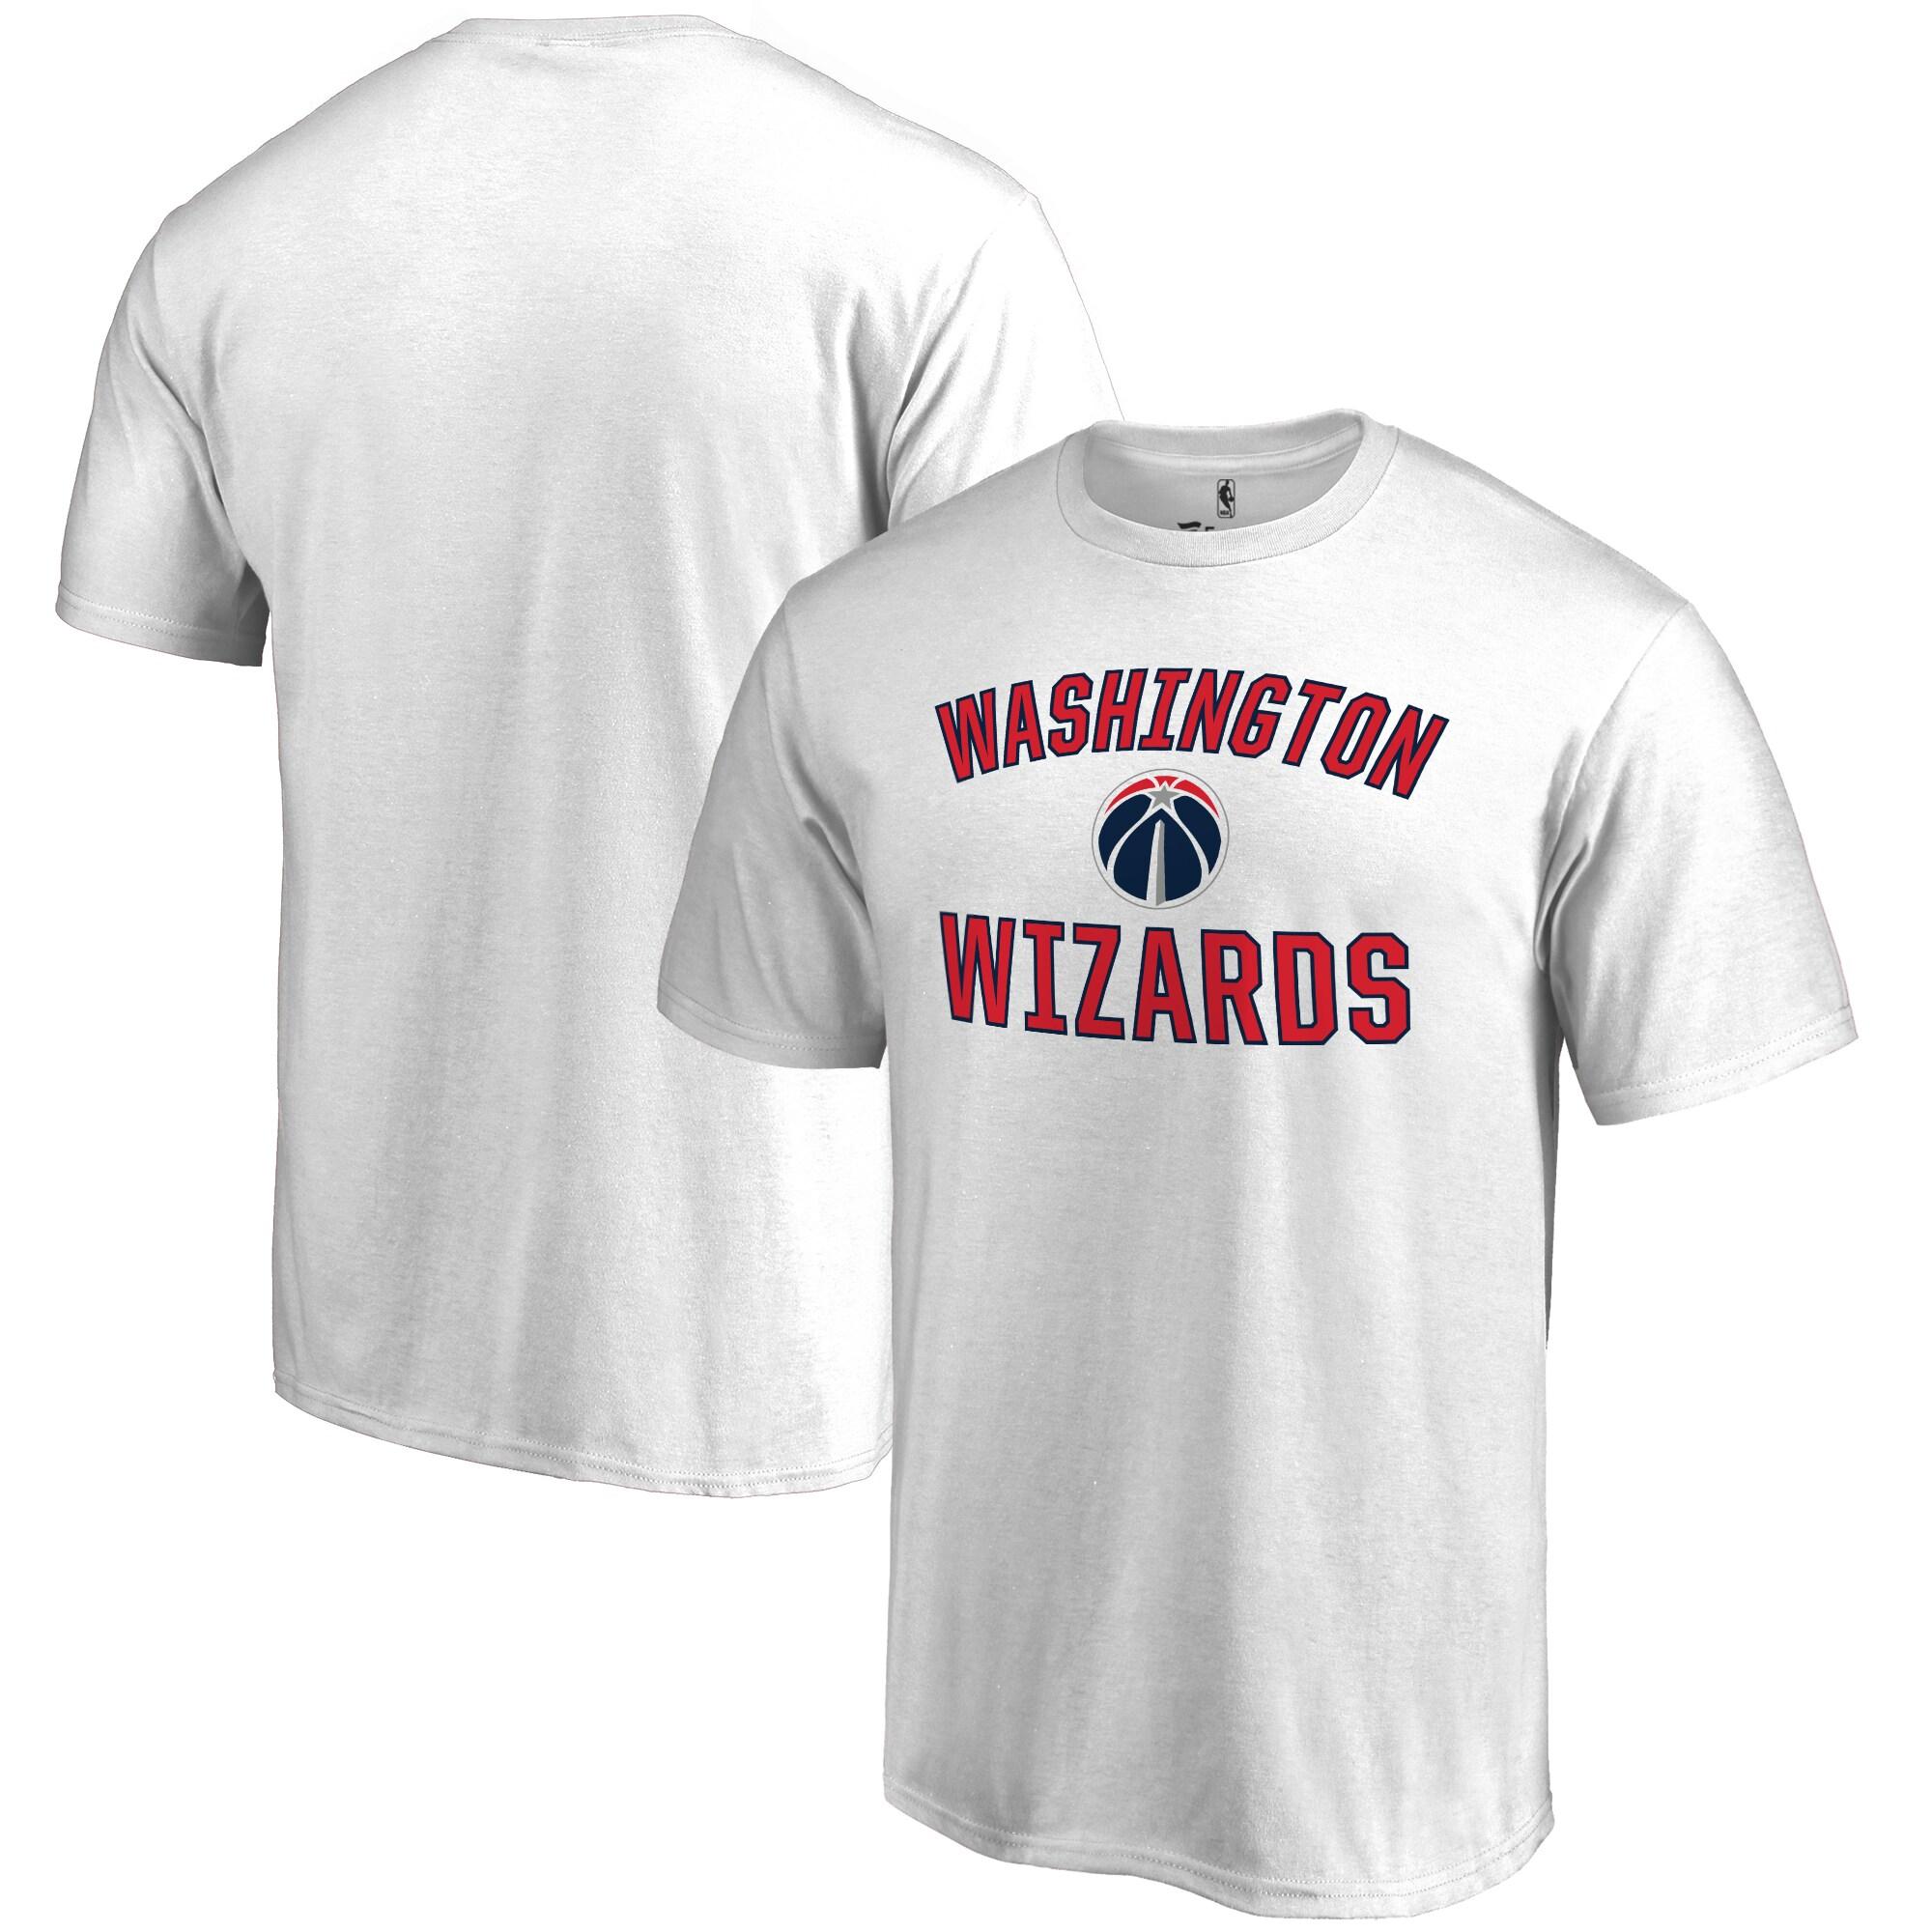 Washington Wizards Big & Tall Victory Arch T-Shirt - White